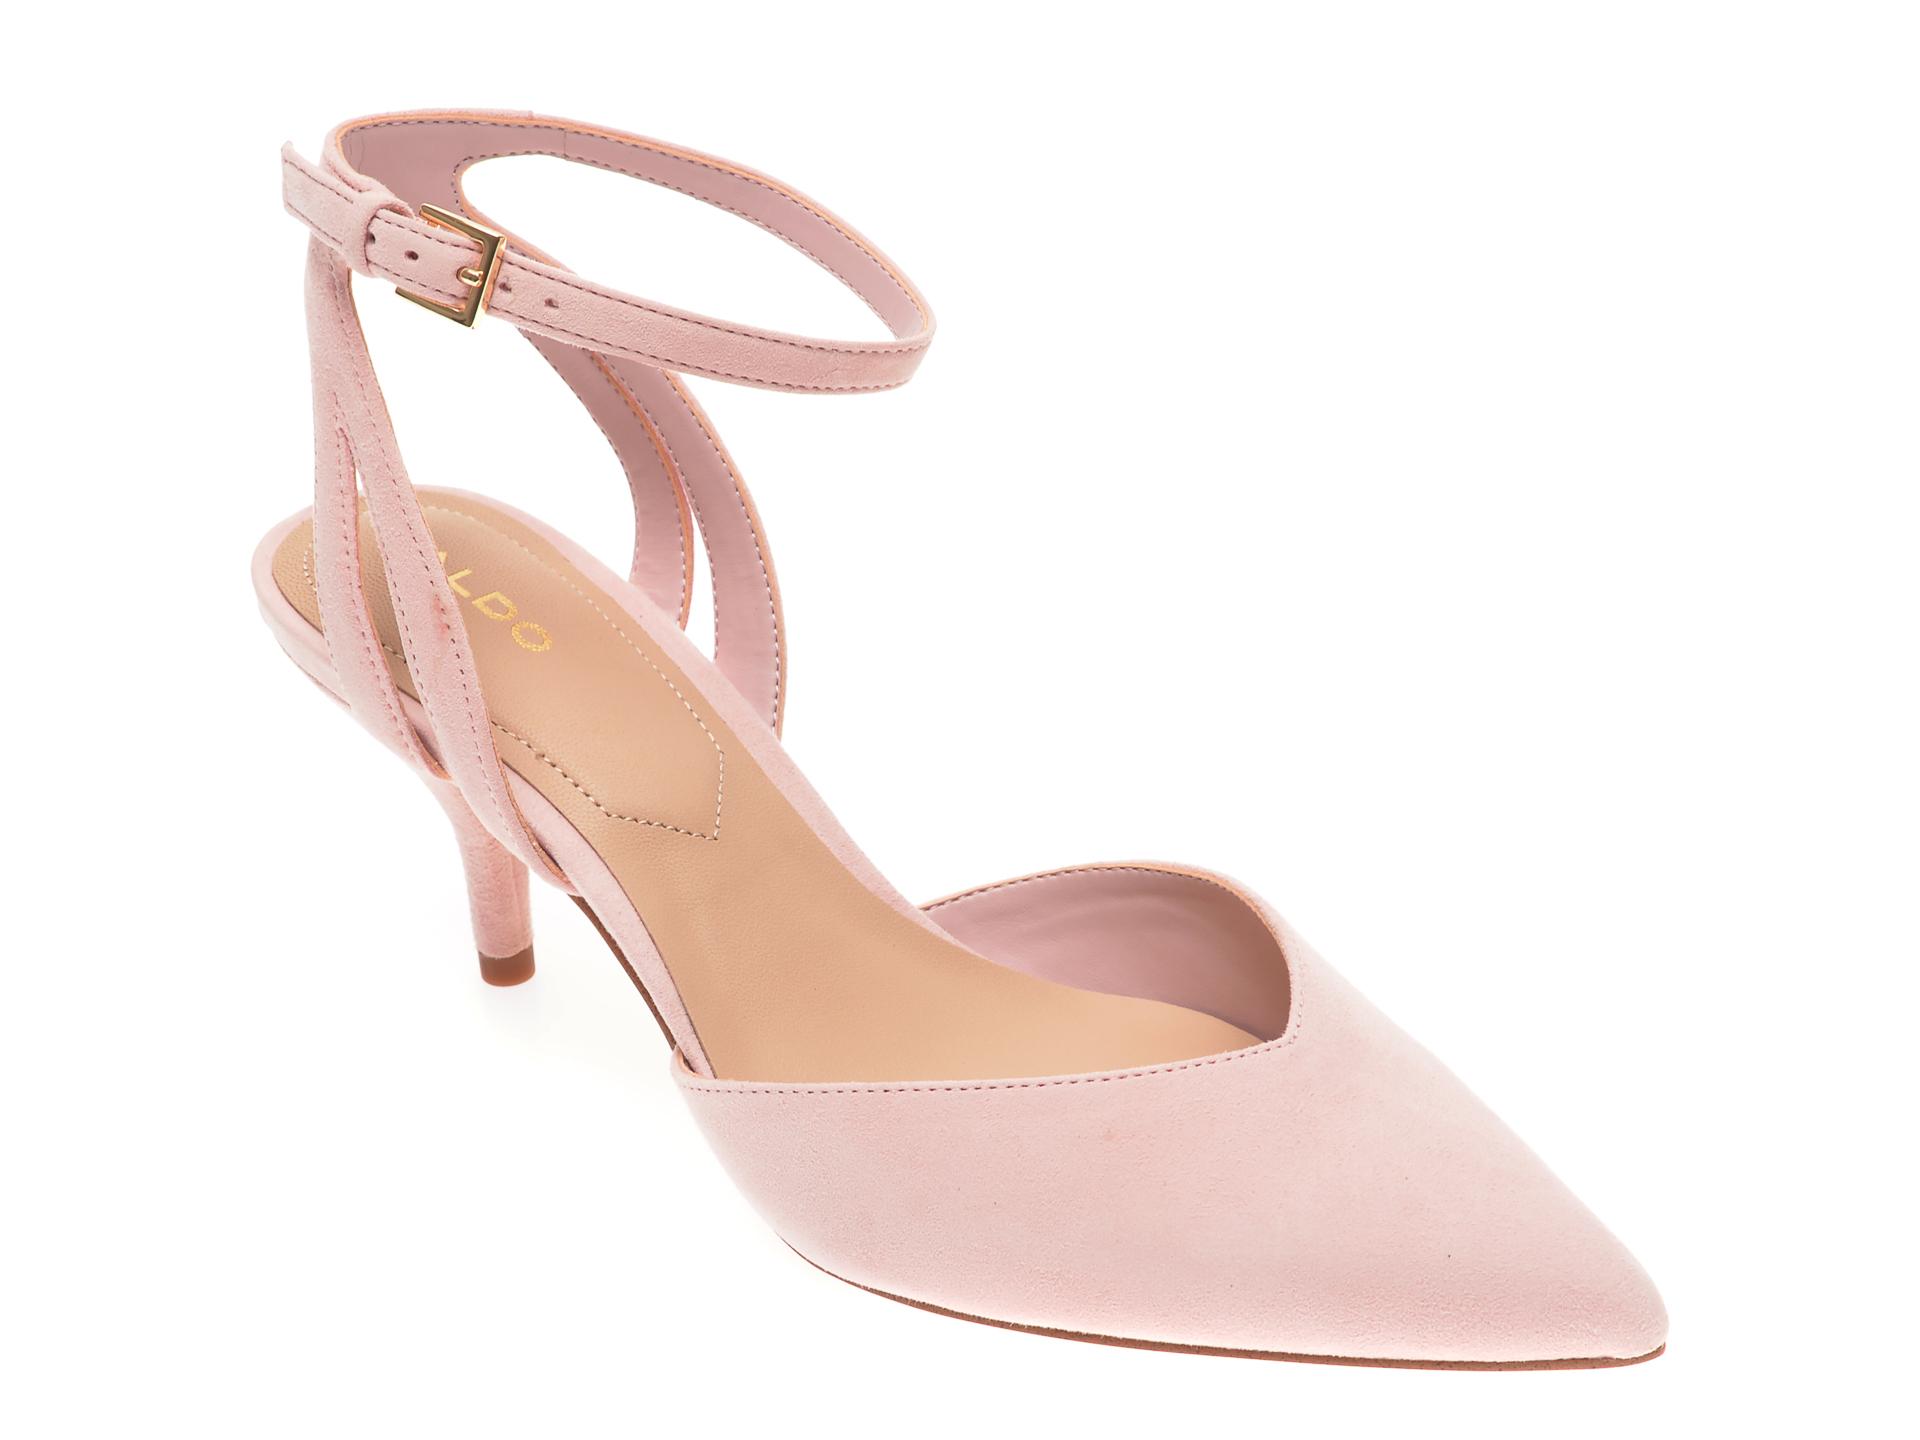 Pantofi ALDO roz, Krasnoya680, din piele intoarsa imagine otter.ro